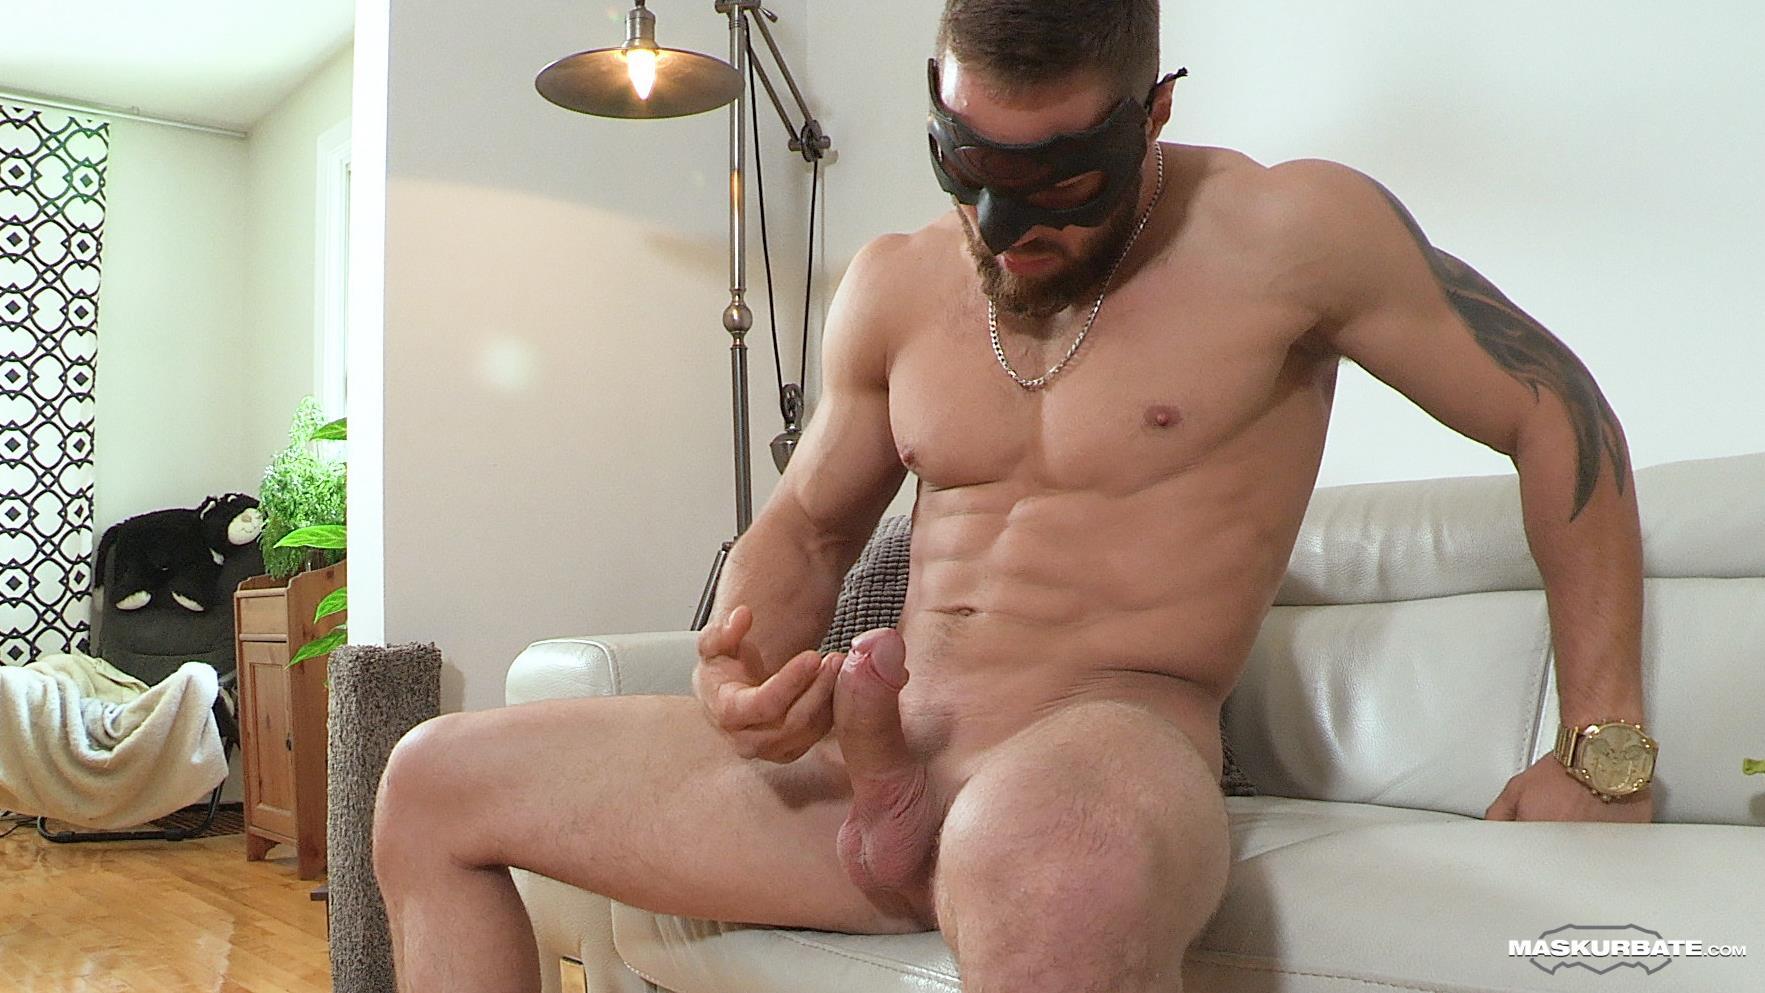 hot young gay boy free